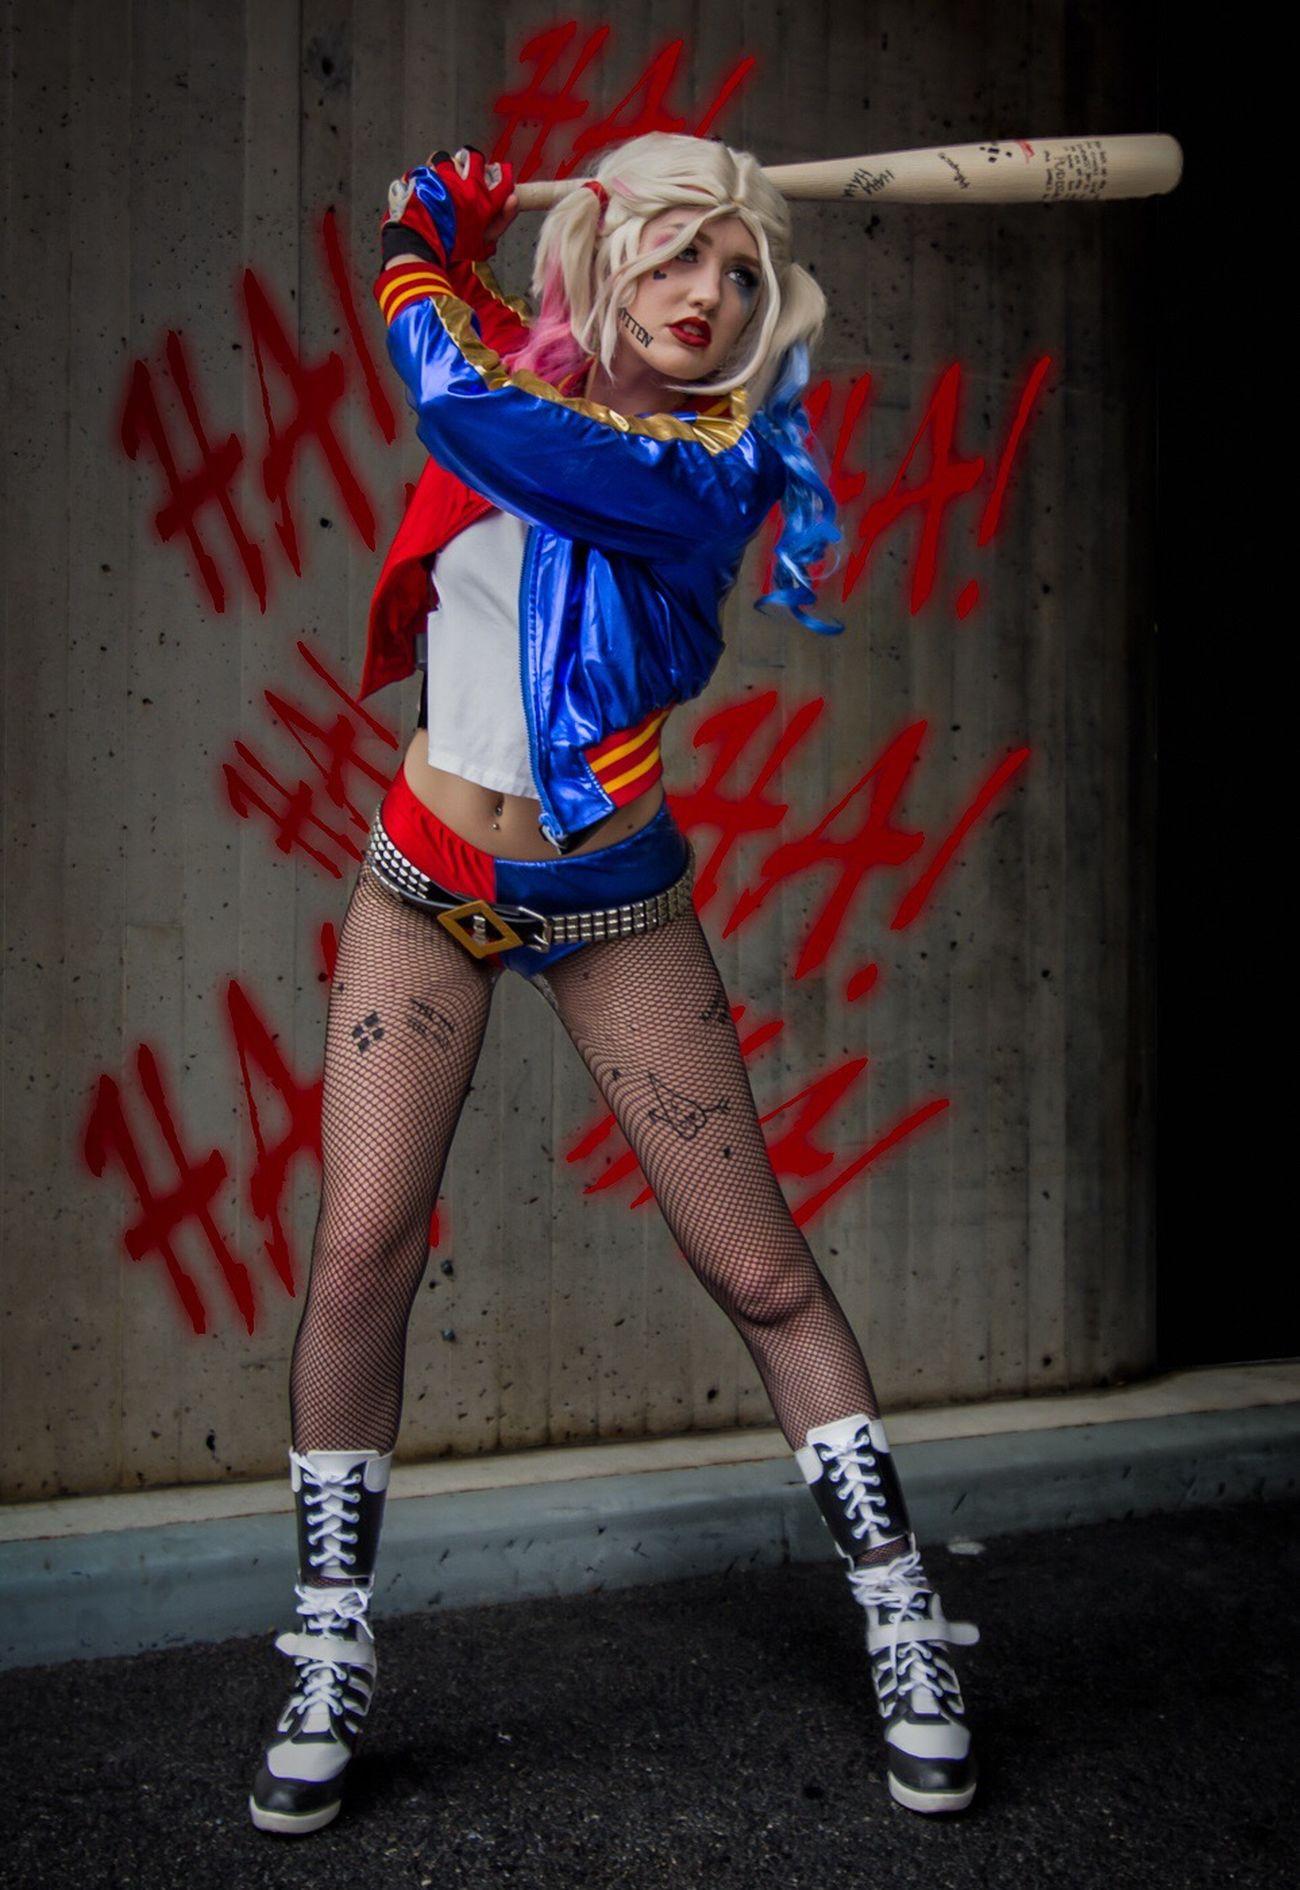 Harley Quinn Suicide Squad Harleyquinn Cosplayer Nycc2016 NYCC Cosplay Sexygirl Batman Suicide Squad Fishnetstockings Legs SexyGirl.♥ LongLegs